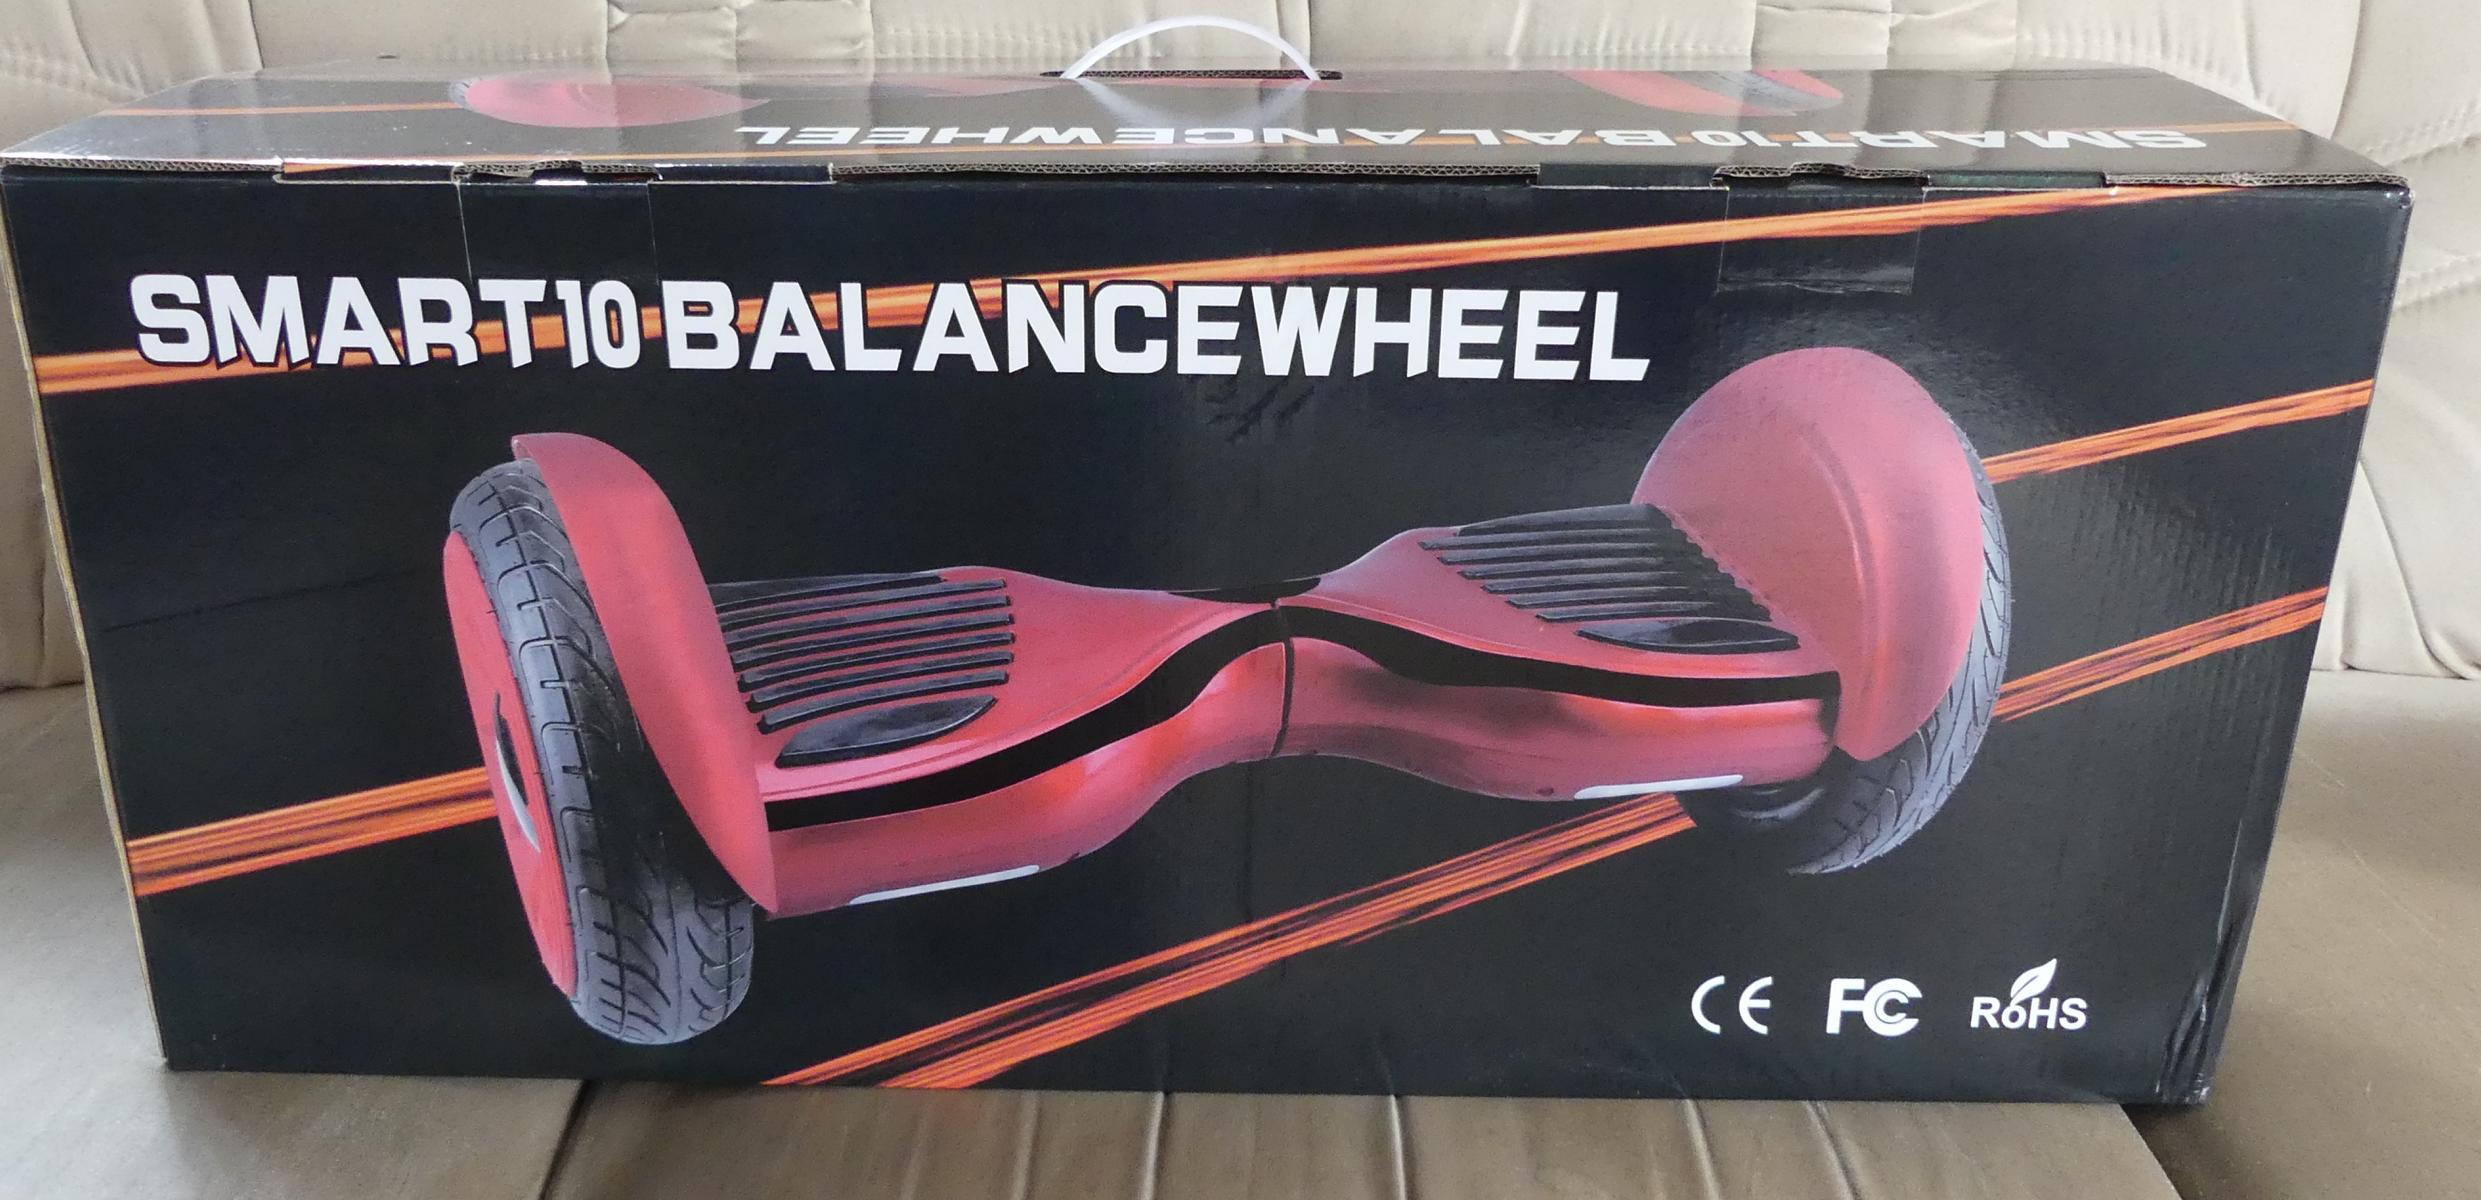 10 Zoll Hoverboard Smartwheel Verpackung